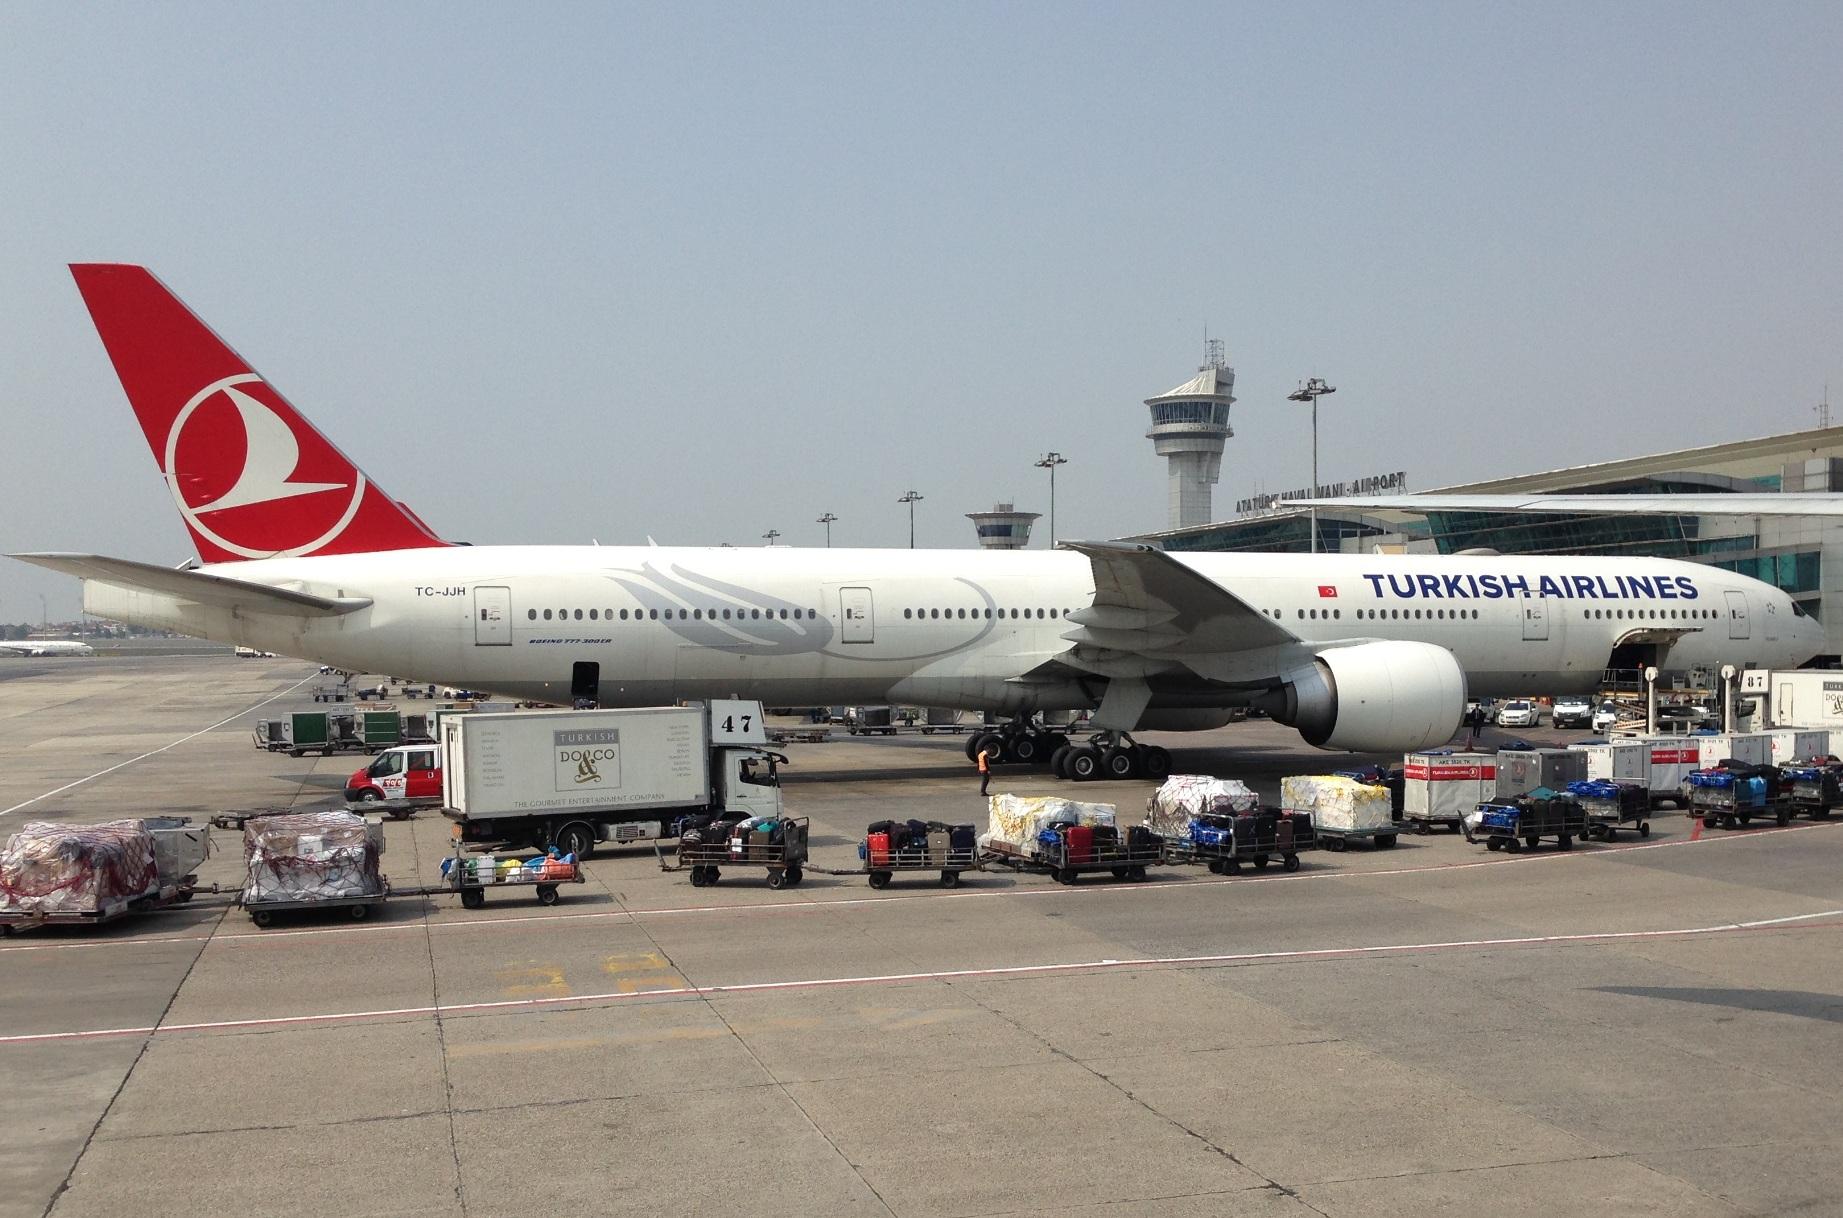 THY_Turkish-Airlines-Boeing-777-300ER-@-Istanbul-Ataturk-Airport-TC-JJH_002